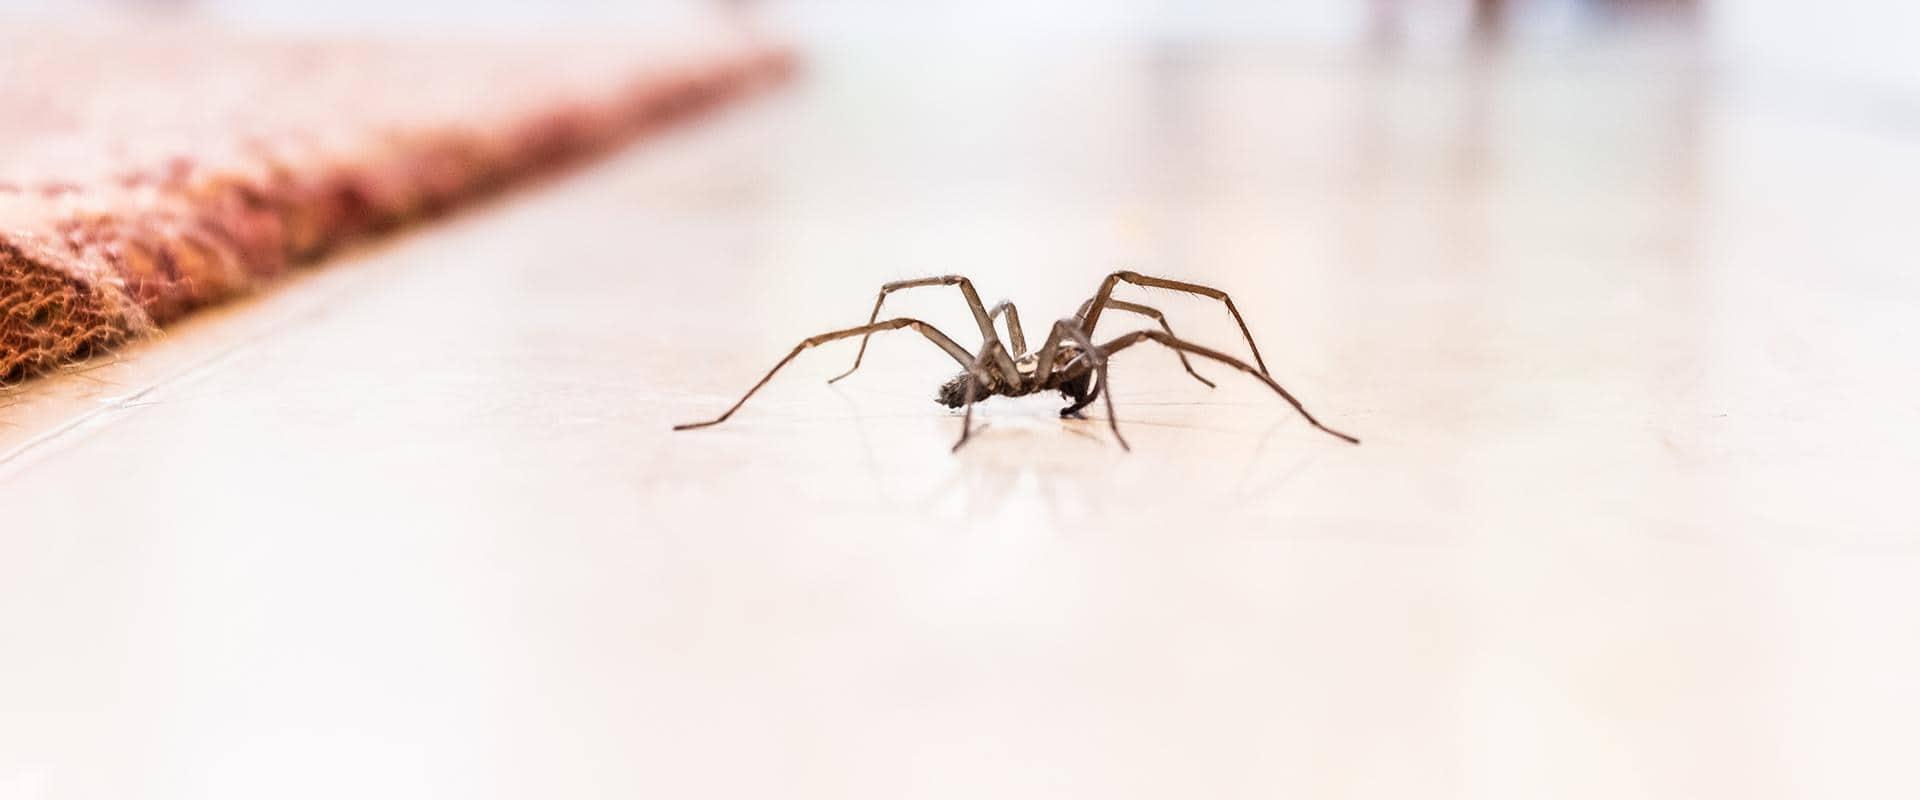 spider in a washington home